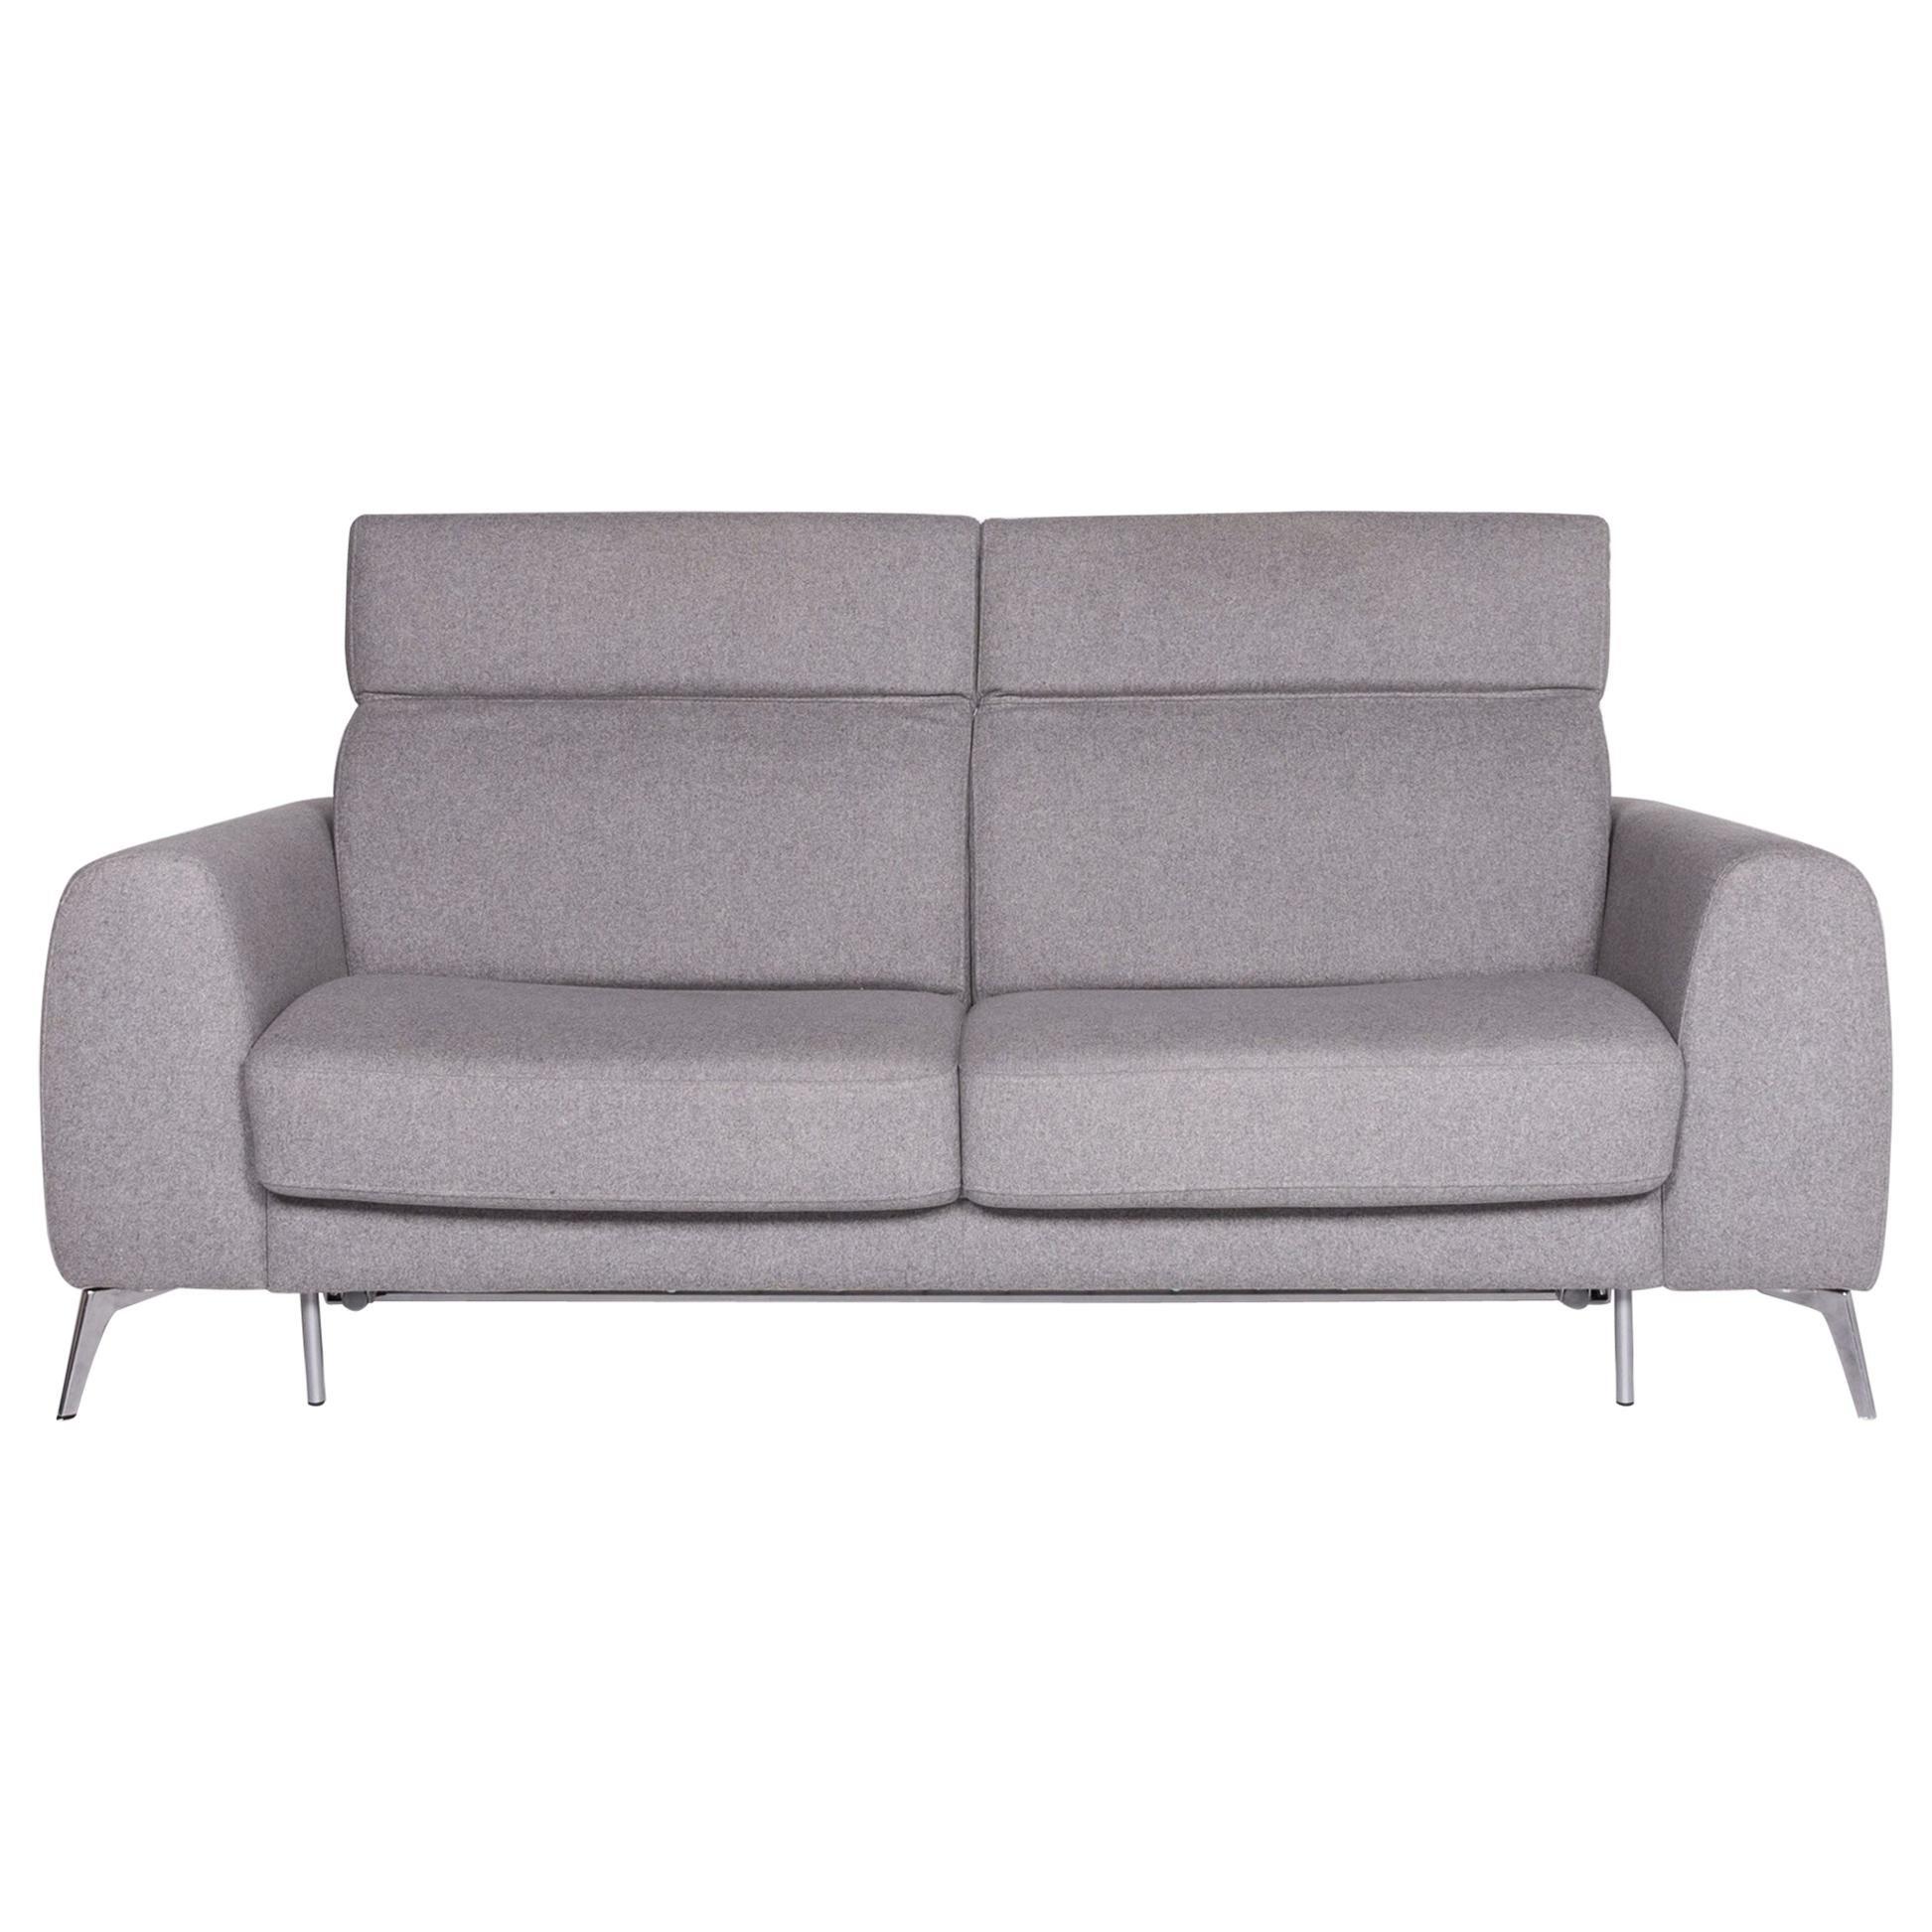 Remarkable Madison Avenue Sofa Cjindustries Chair Design For Home Cjindustriesco